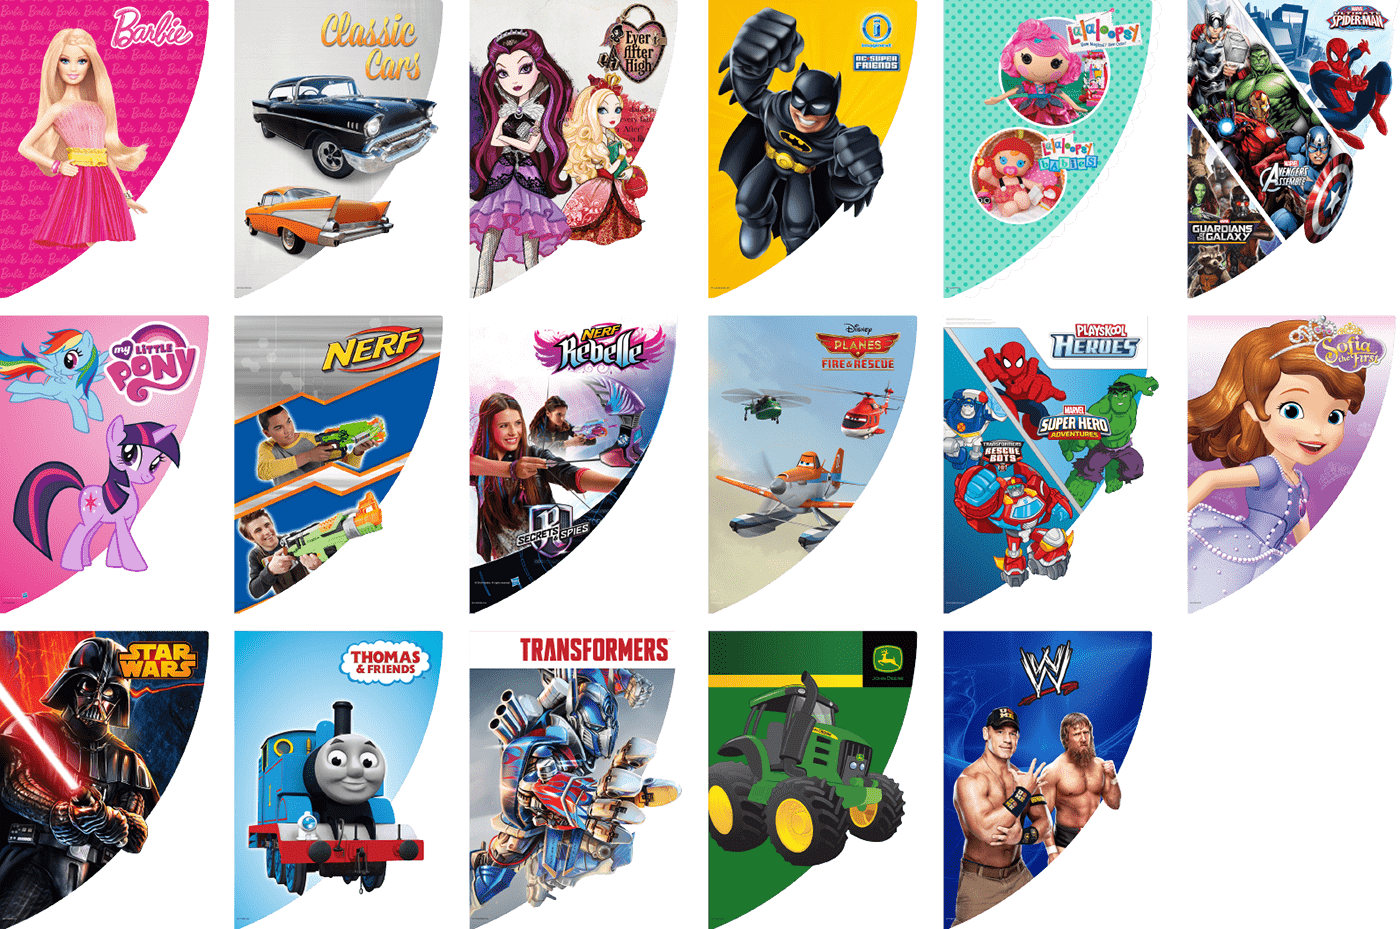 store design merchandising toys Hot Wheels mattel disney graphic design  digital illustration